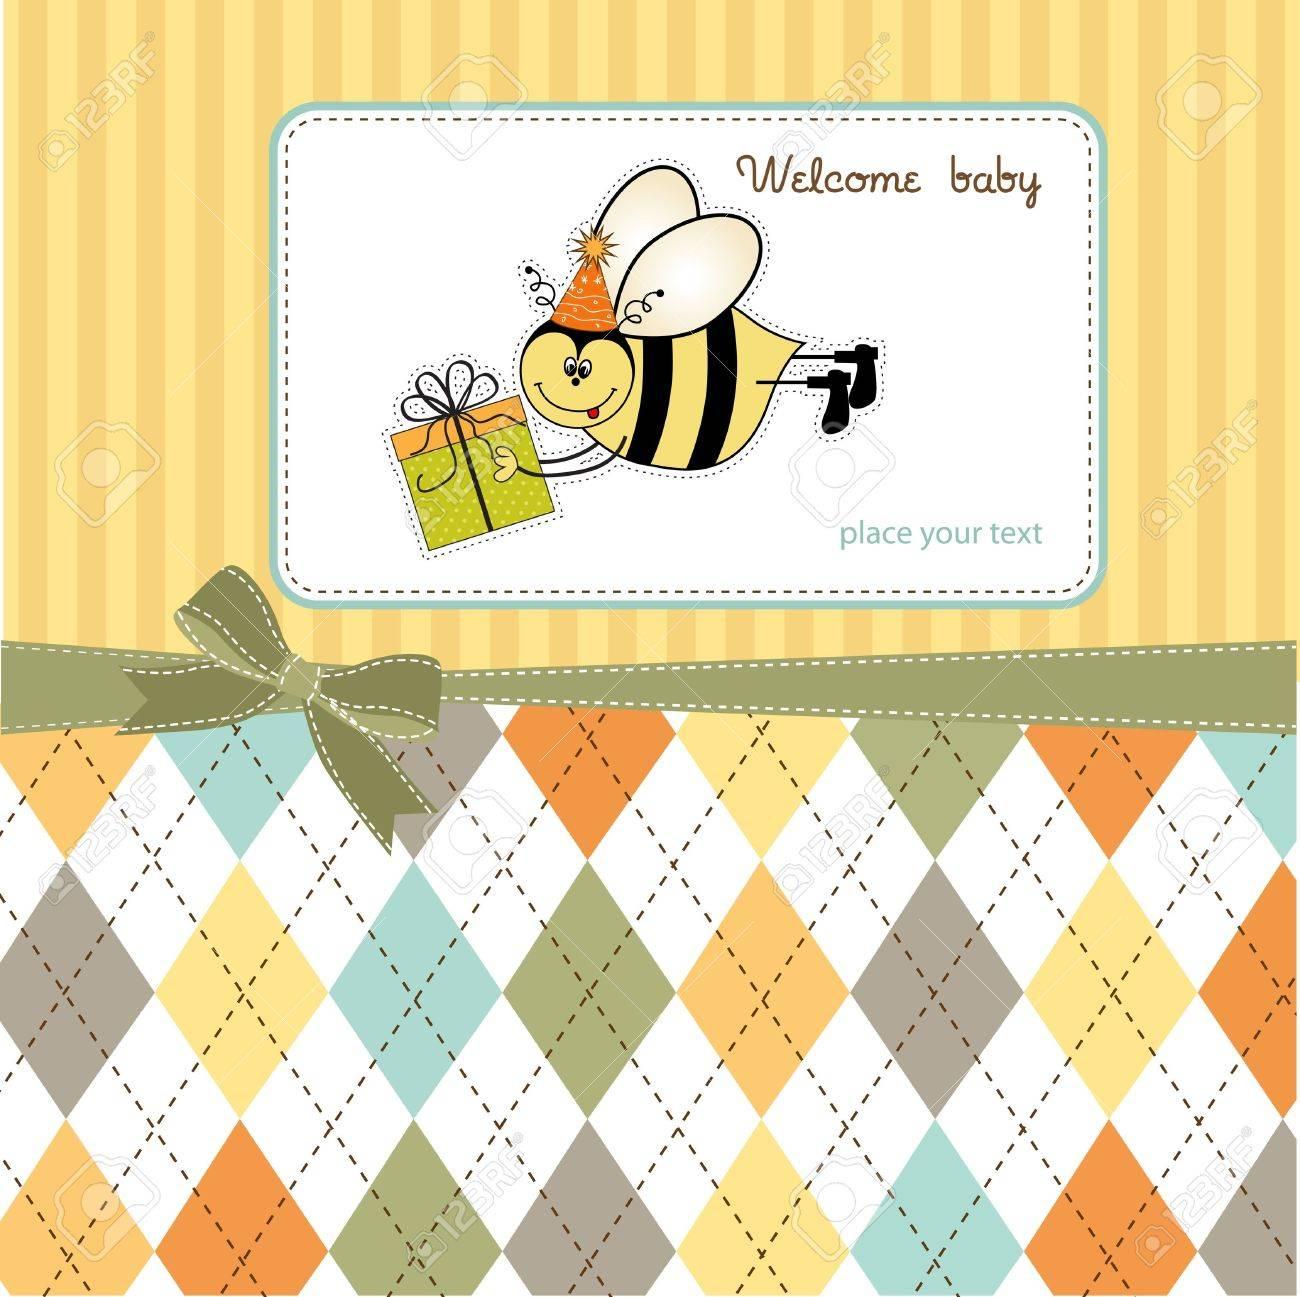 welcome baby Stock Vector - 11154236